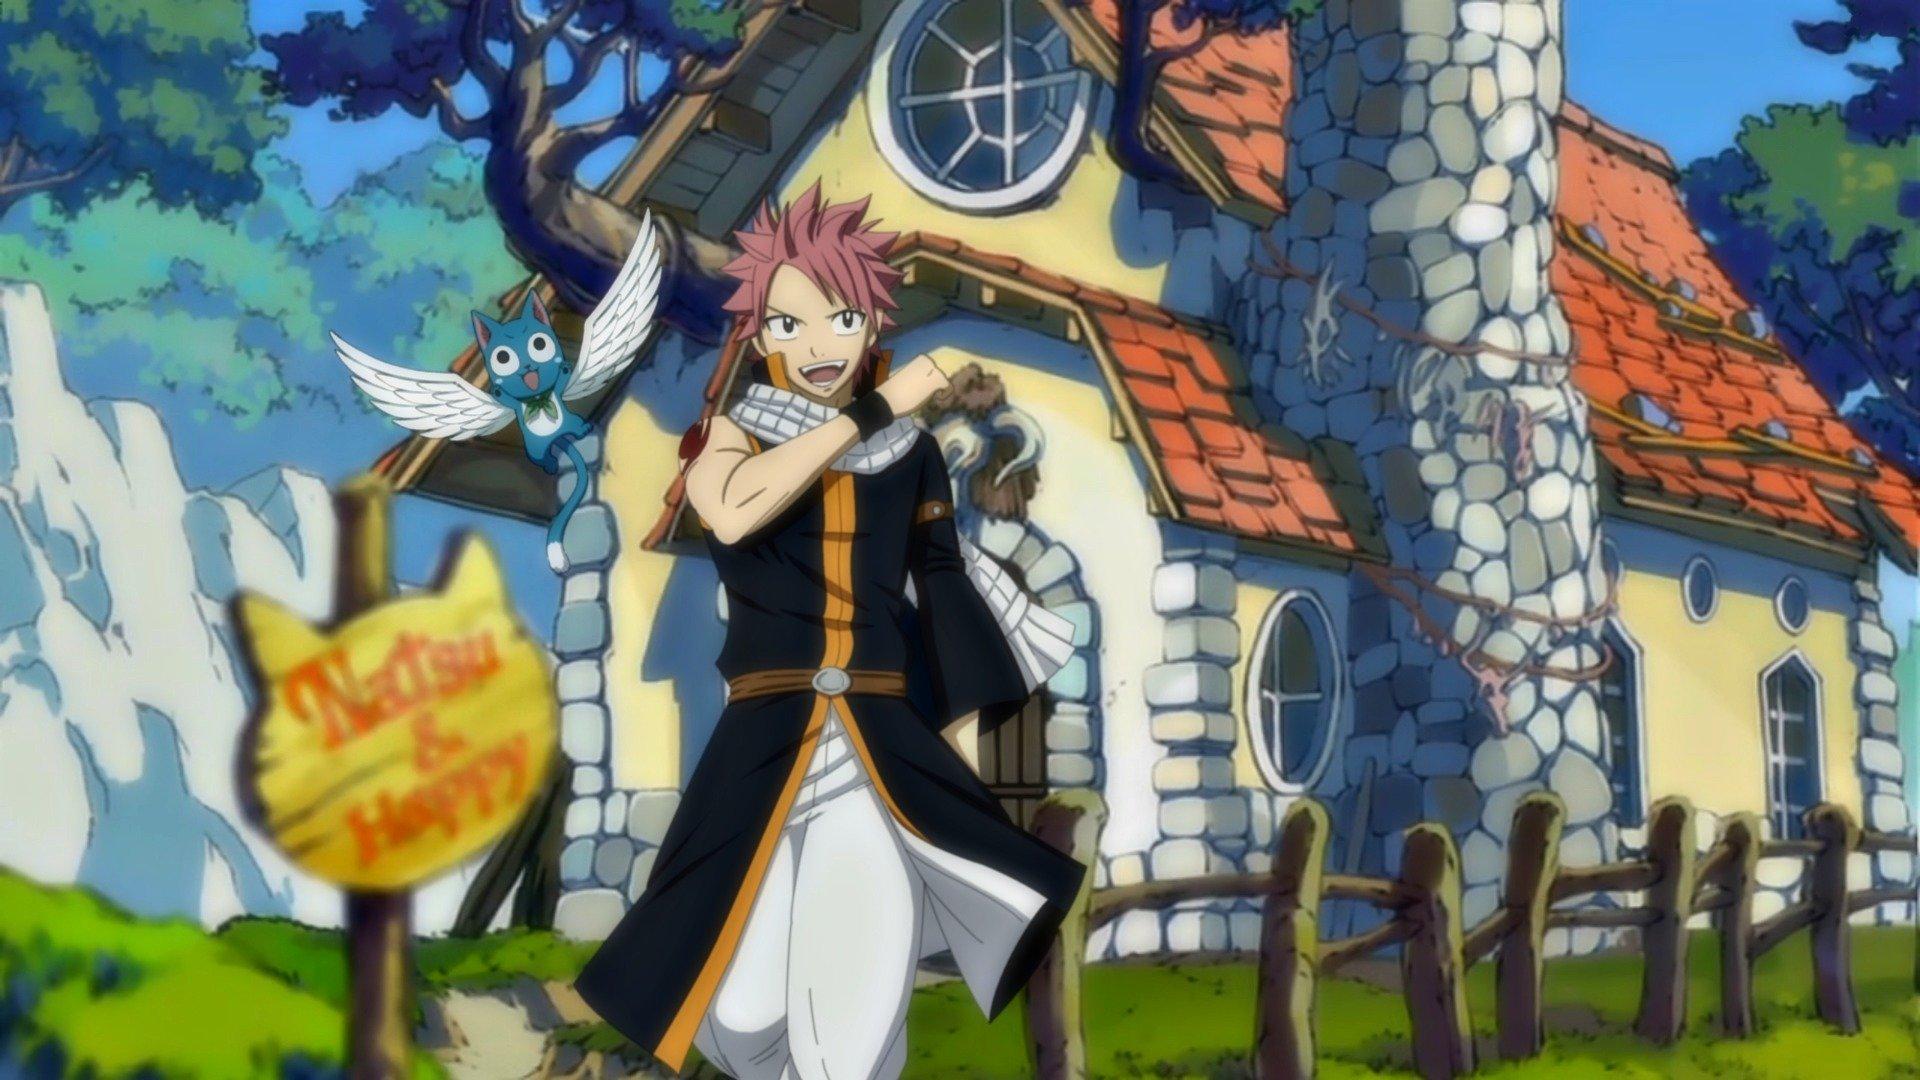 Fairy Tail Wallpaper - Fairy Tail Desktop Background Hd , HD Wallpaper & Backgrounds